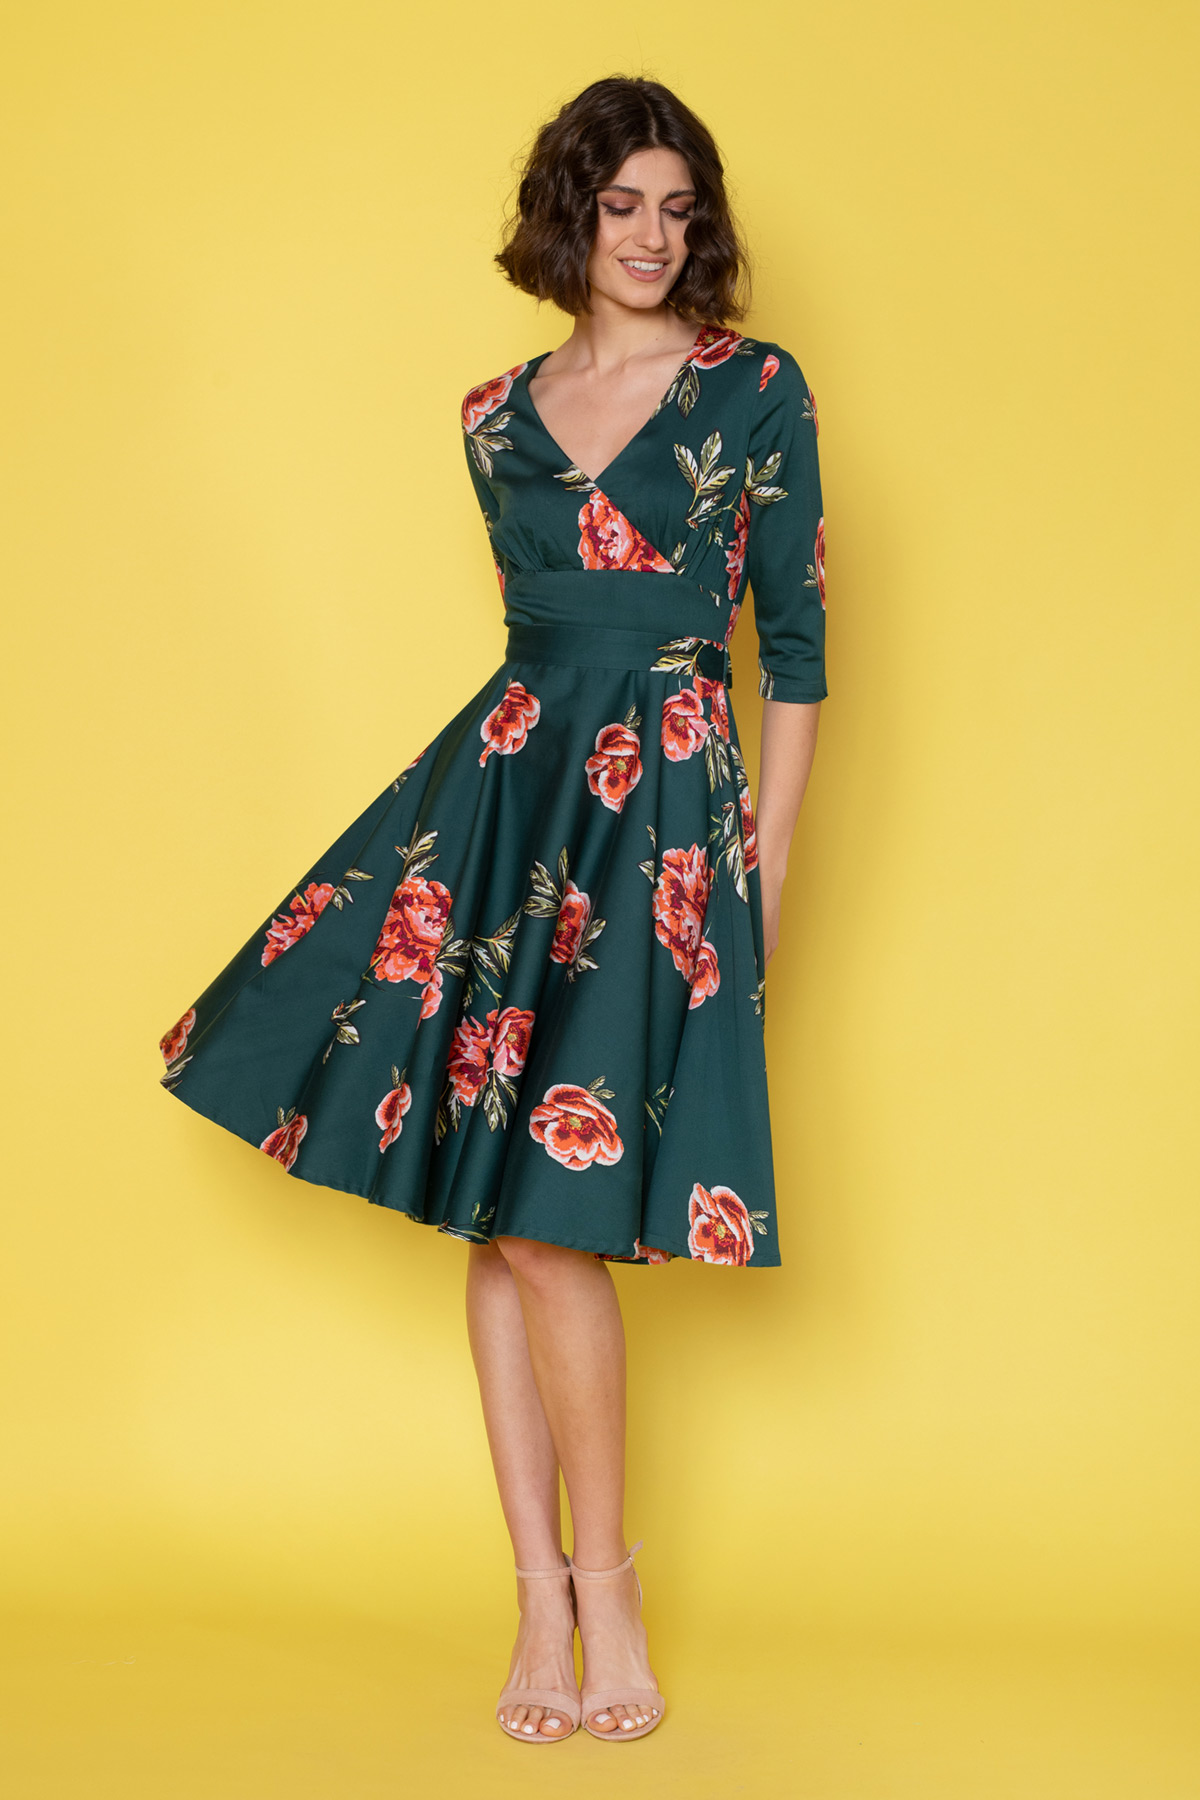 50s φλοράλ φόρεμα vintage με λουλούδια και 3/4 μανίκια, σε μεσάτη γραμμή, με κρουαζέ λαιμουδιά και κλος φούστα μέχρι το γόνατο, ιδανικό για όλες τις ώρες!